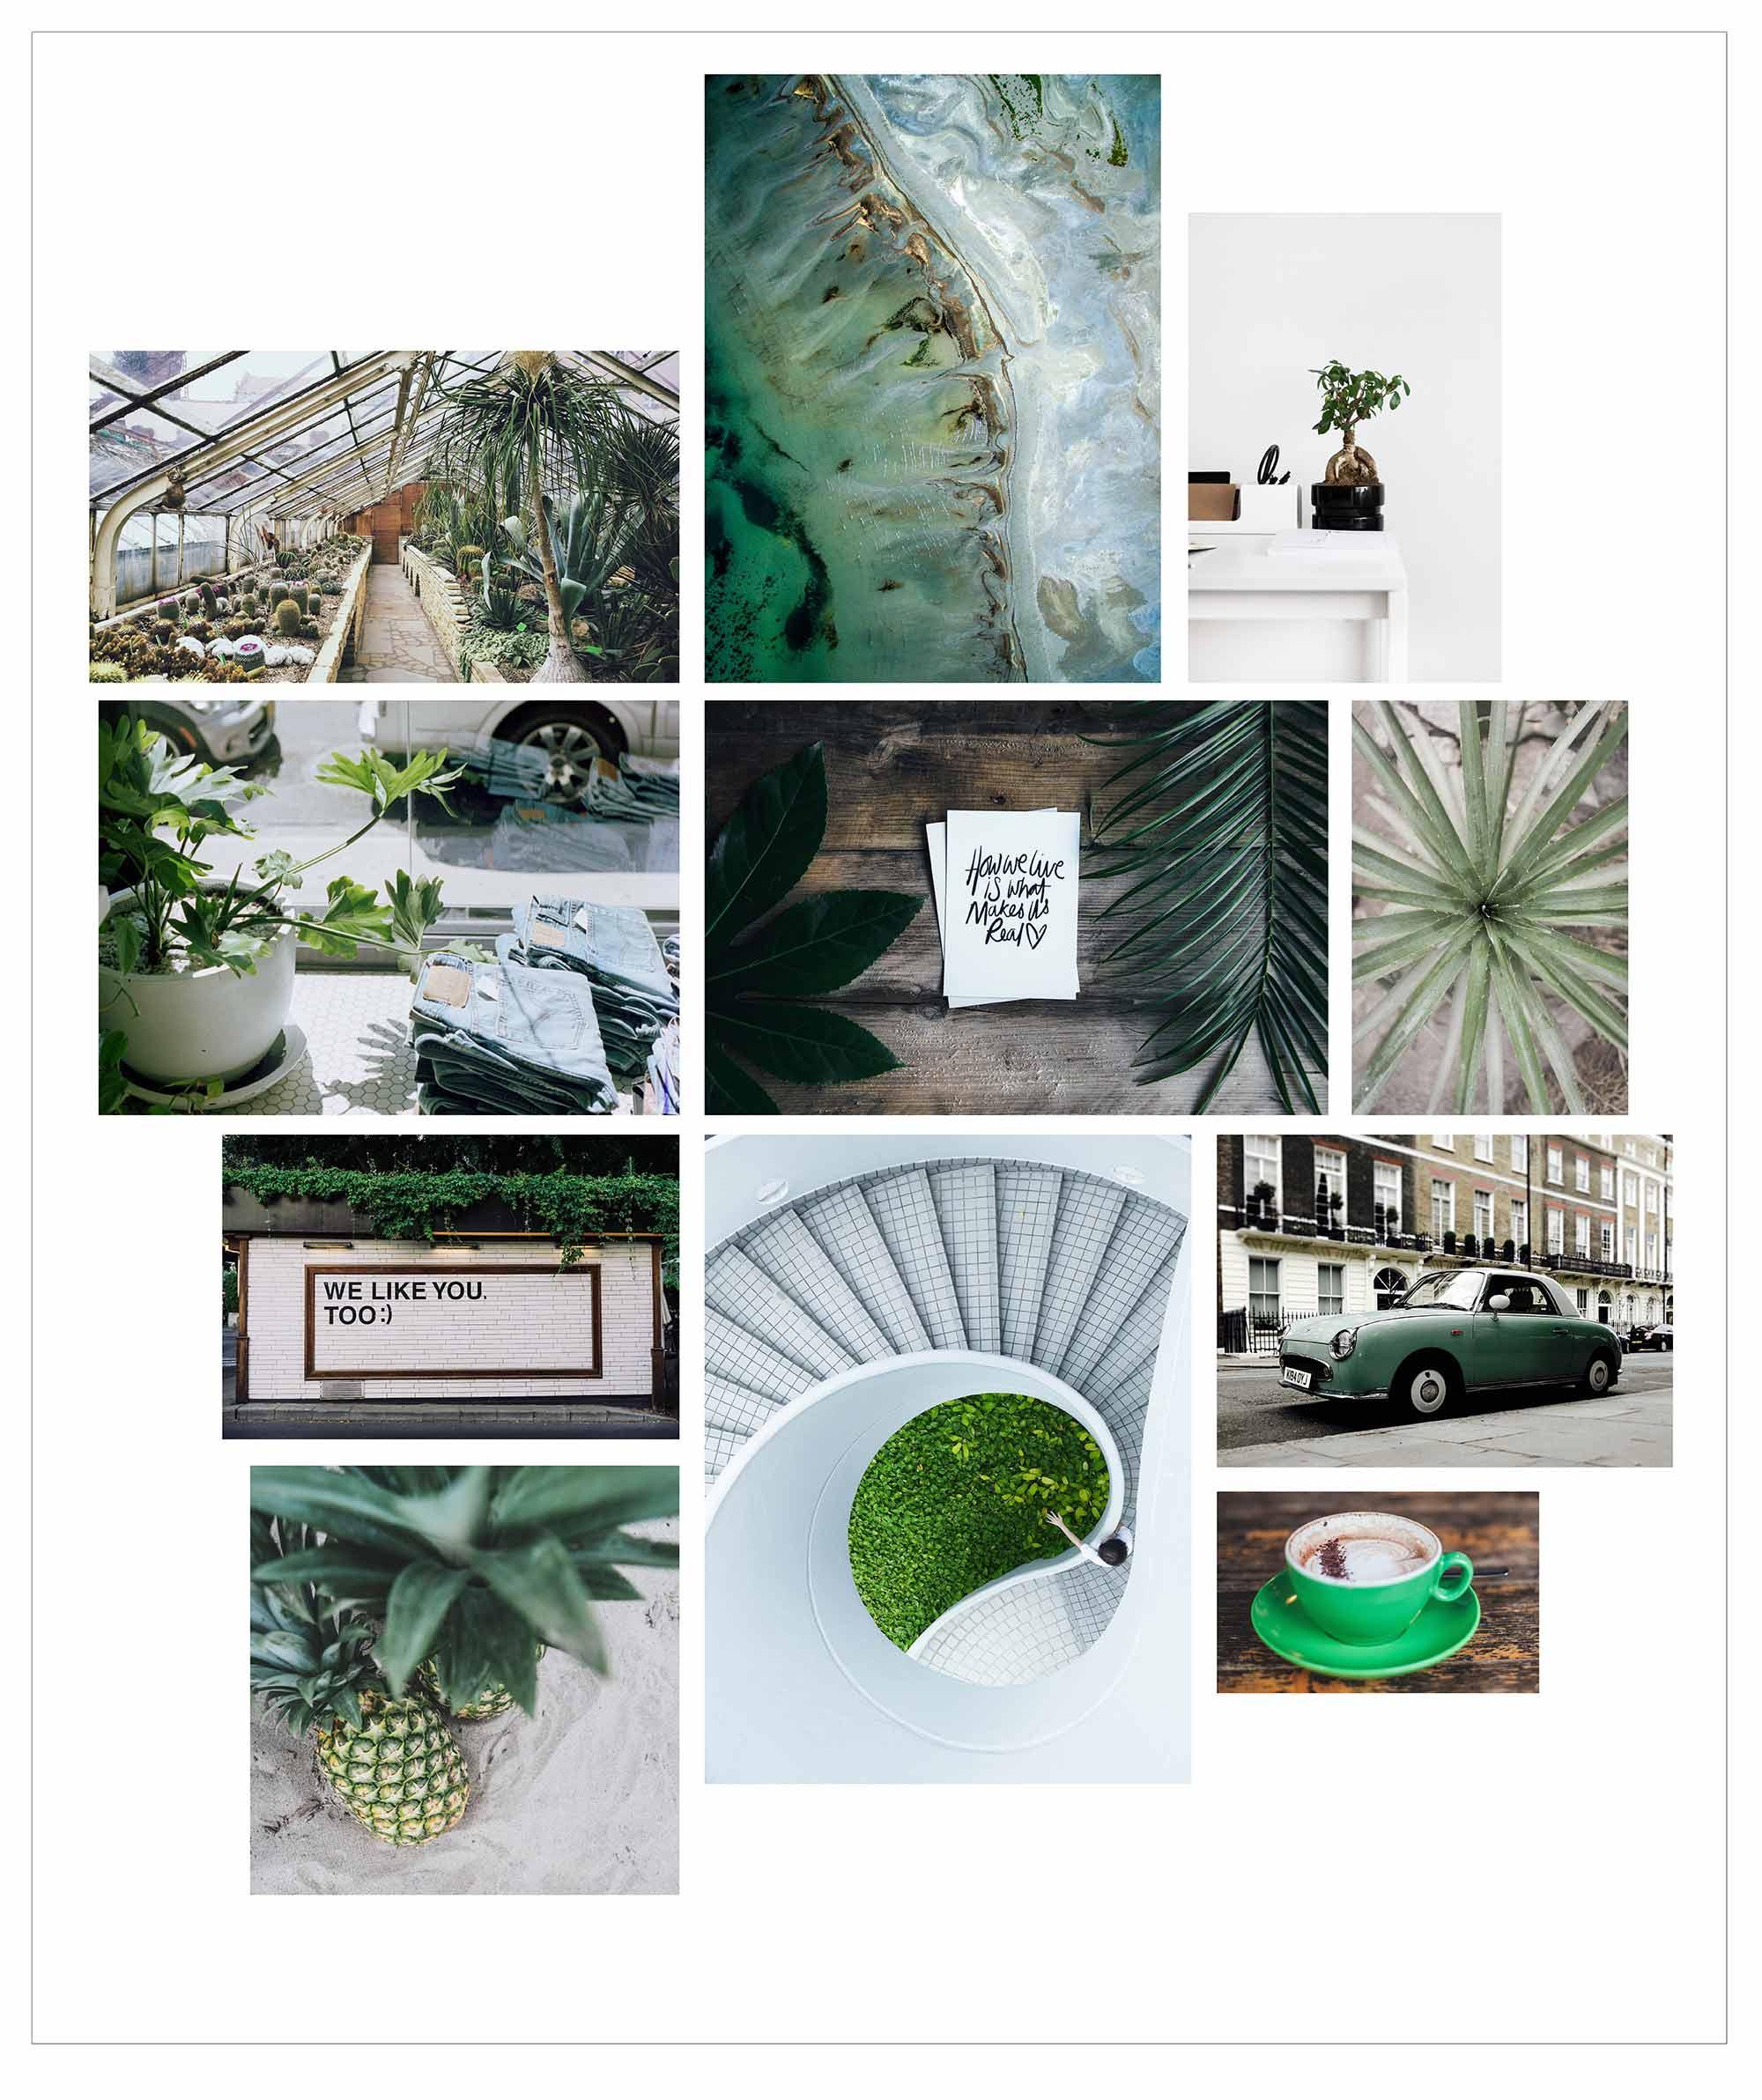 fa928-salt2bsassdesign3apantonec2aecolorgreencollagesalt2bsassdesign3apantonec2aecolorgreencollage.jpg